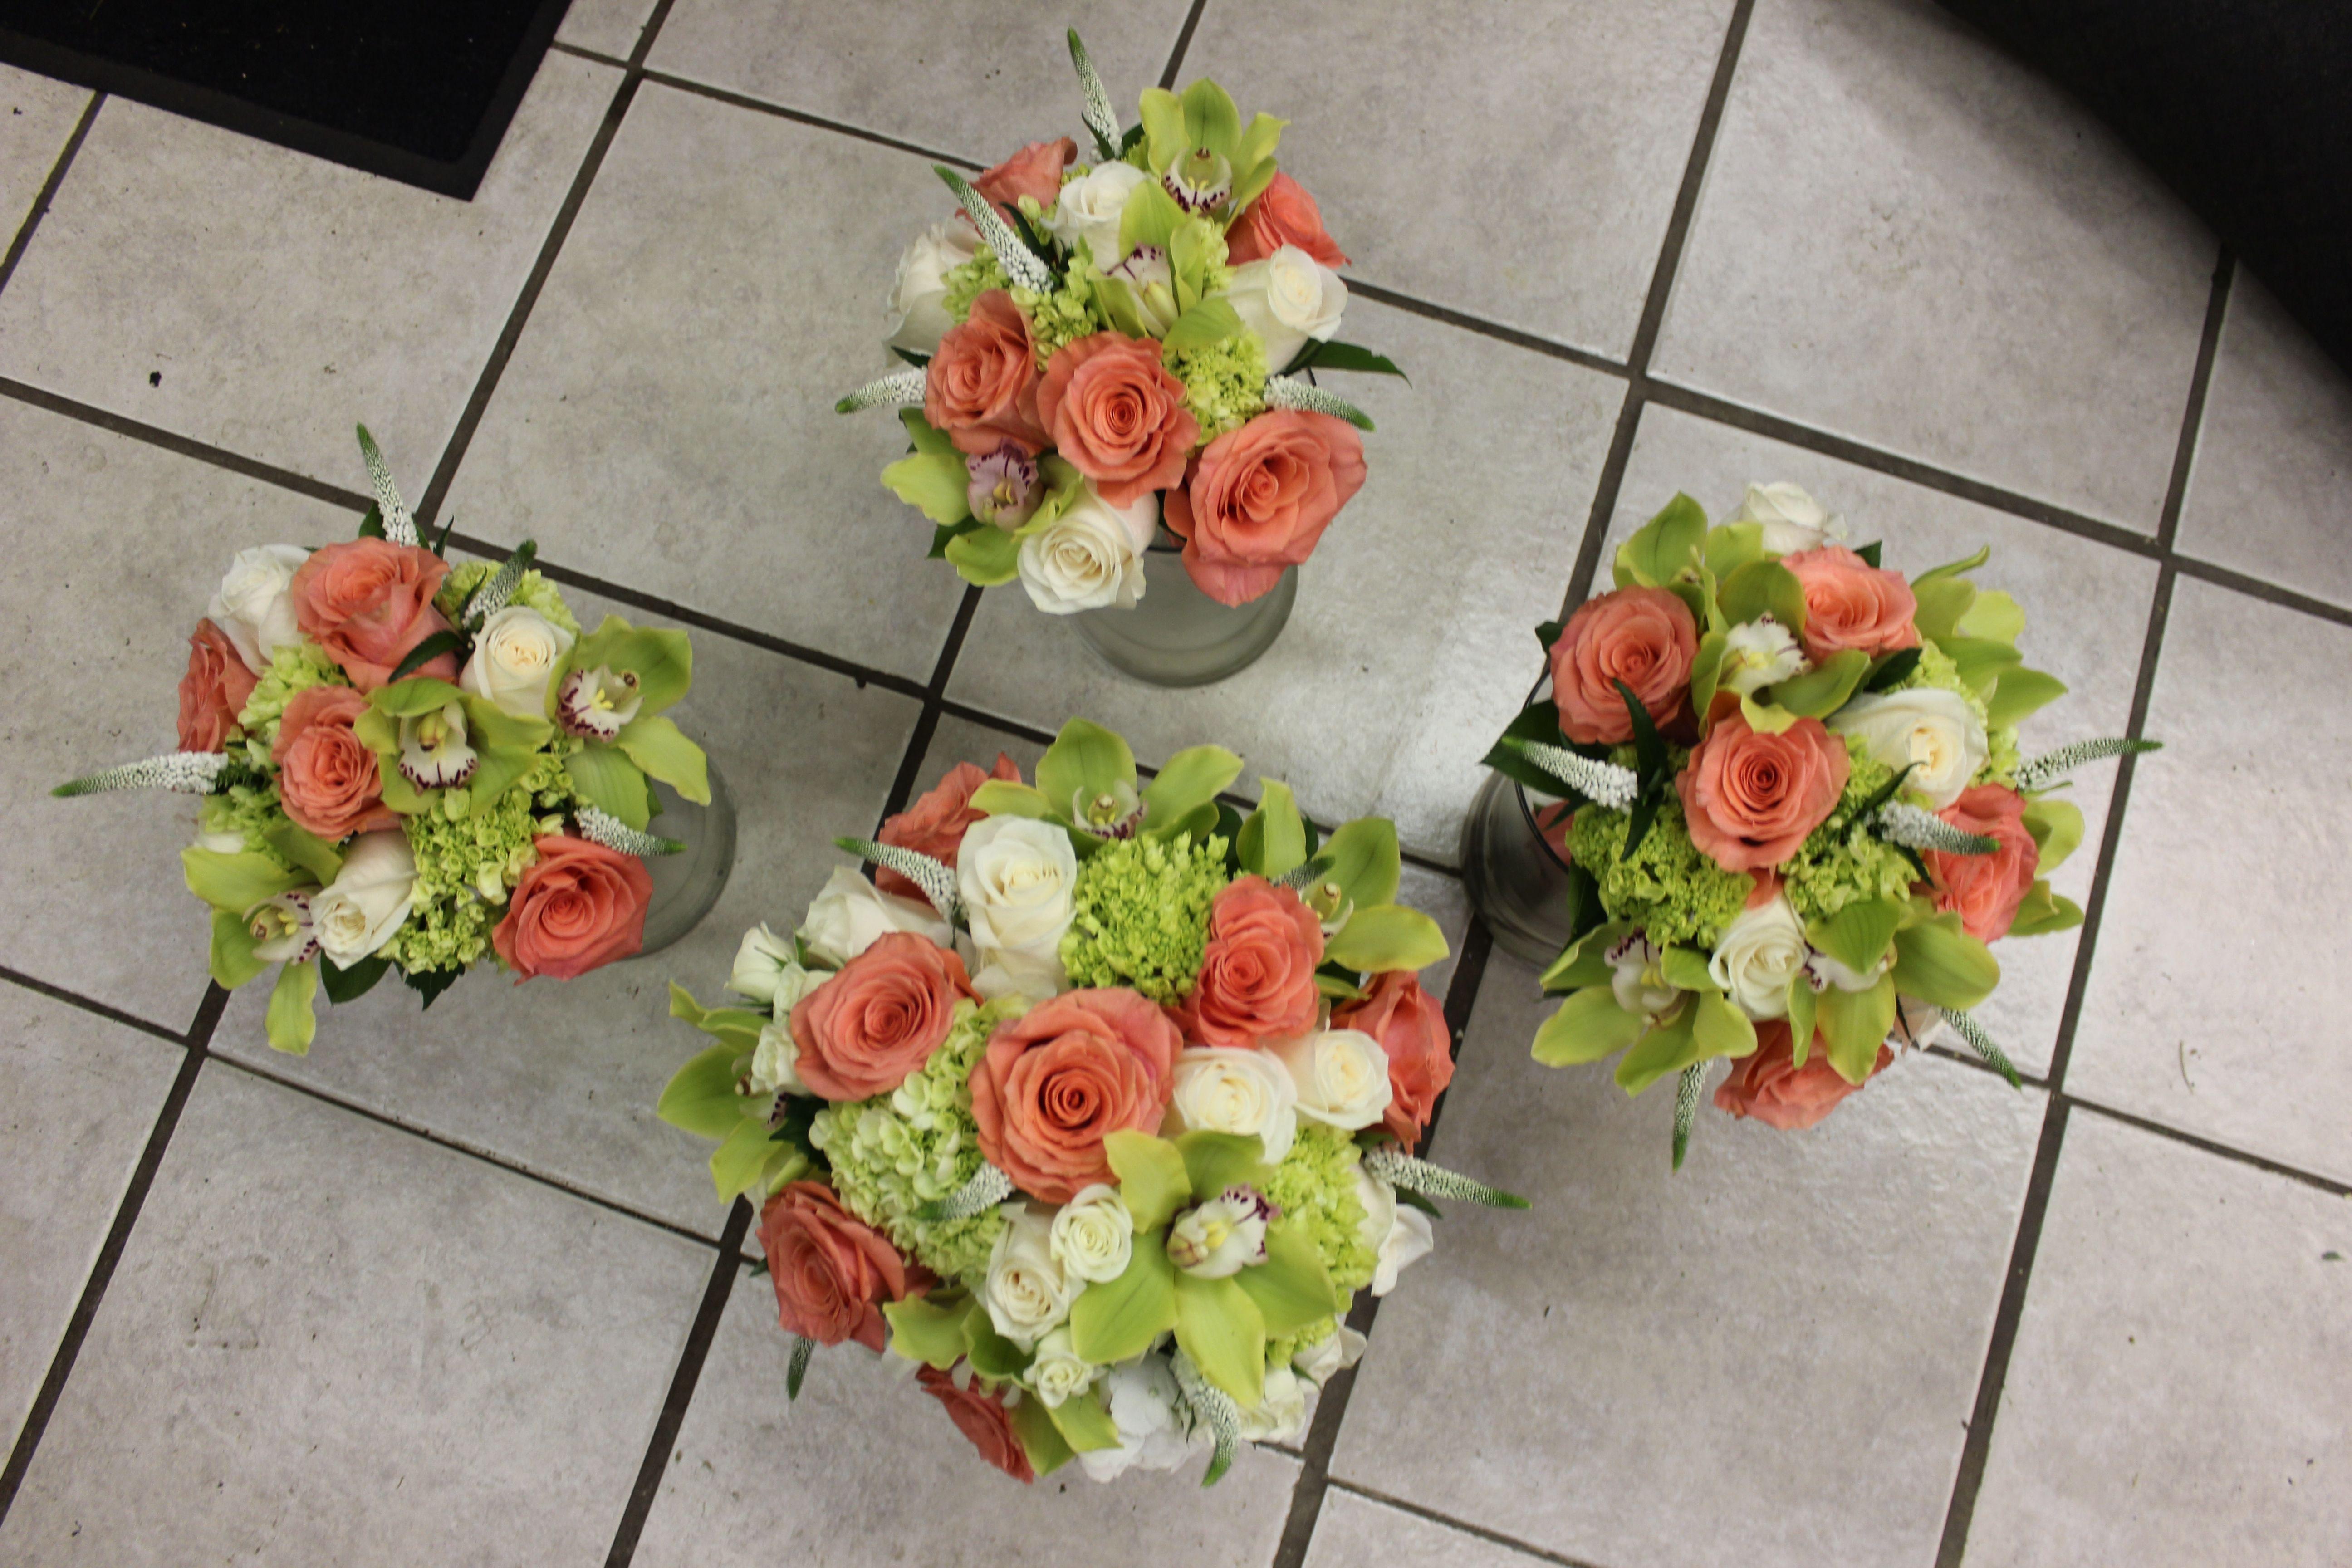 Unusual beautiful beginnings flowers photos wedding and flowers pin by beautiful beginnings flowers on dorette and michaels wedding izmirmasajfo